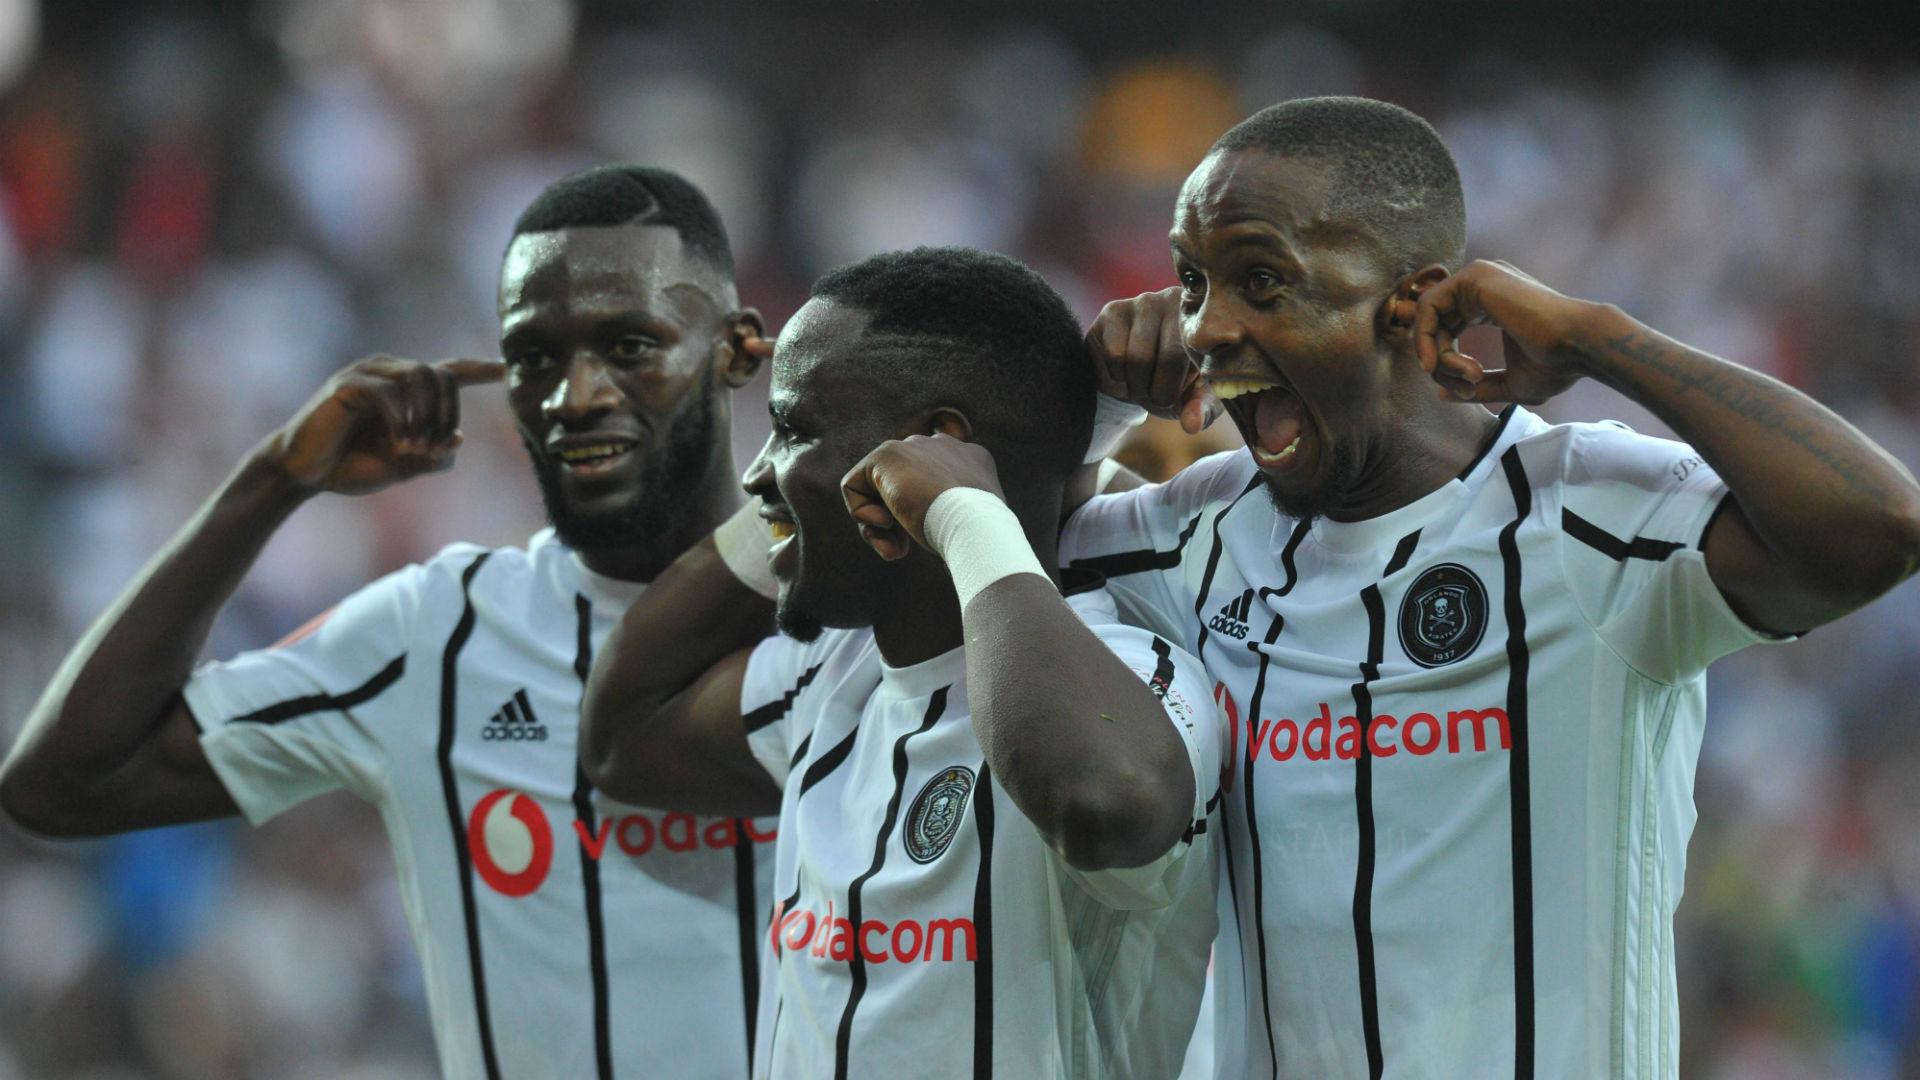 Orlando Pirates 3–1 Highlands Park: Pirates continue with winning run in Soweto